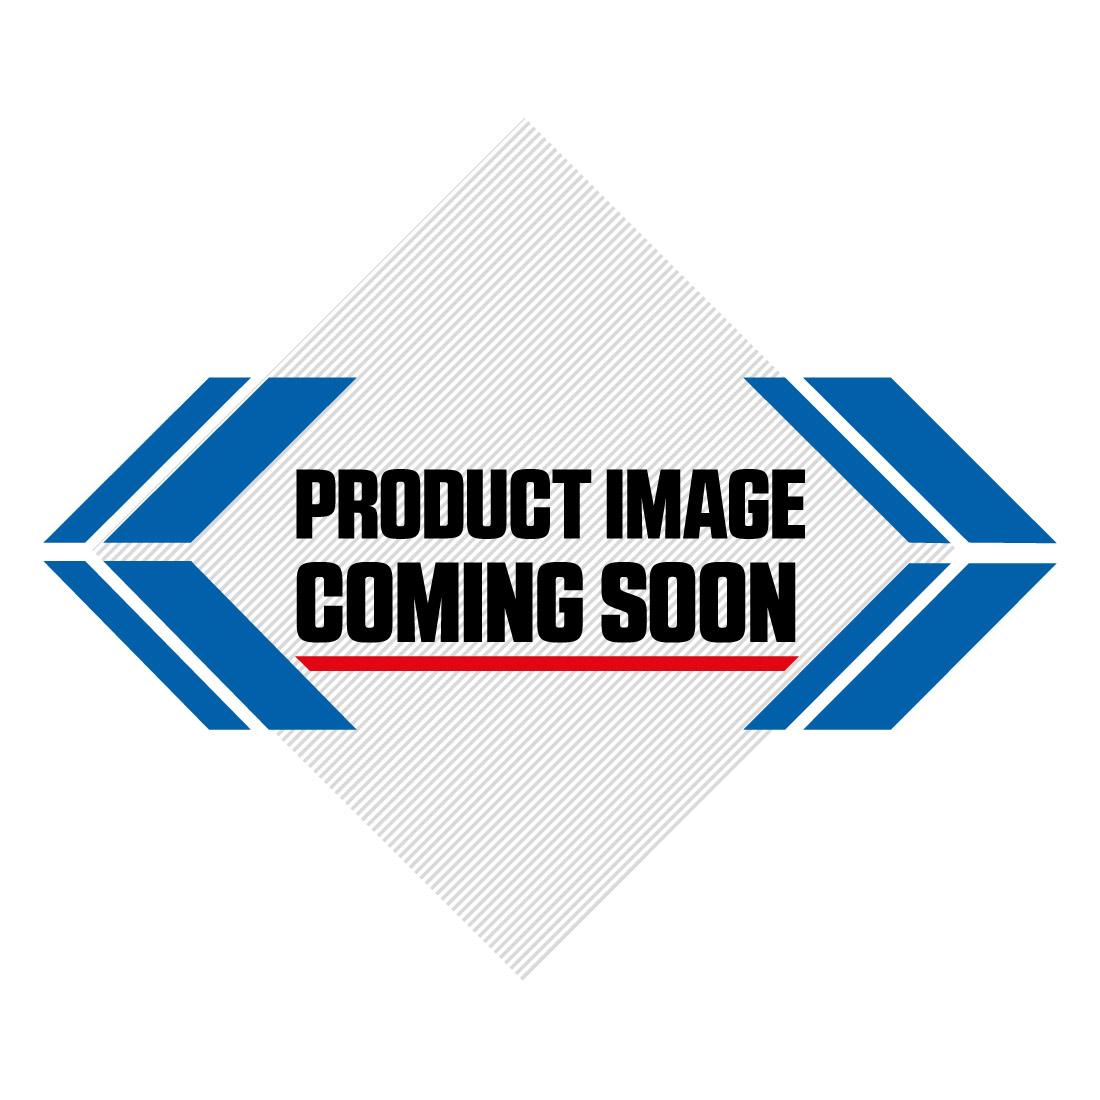 Suzuki Plastic Kit Suzuki RMZ 450 (08-17) White Image-3>